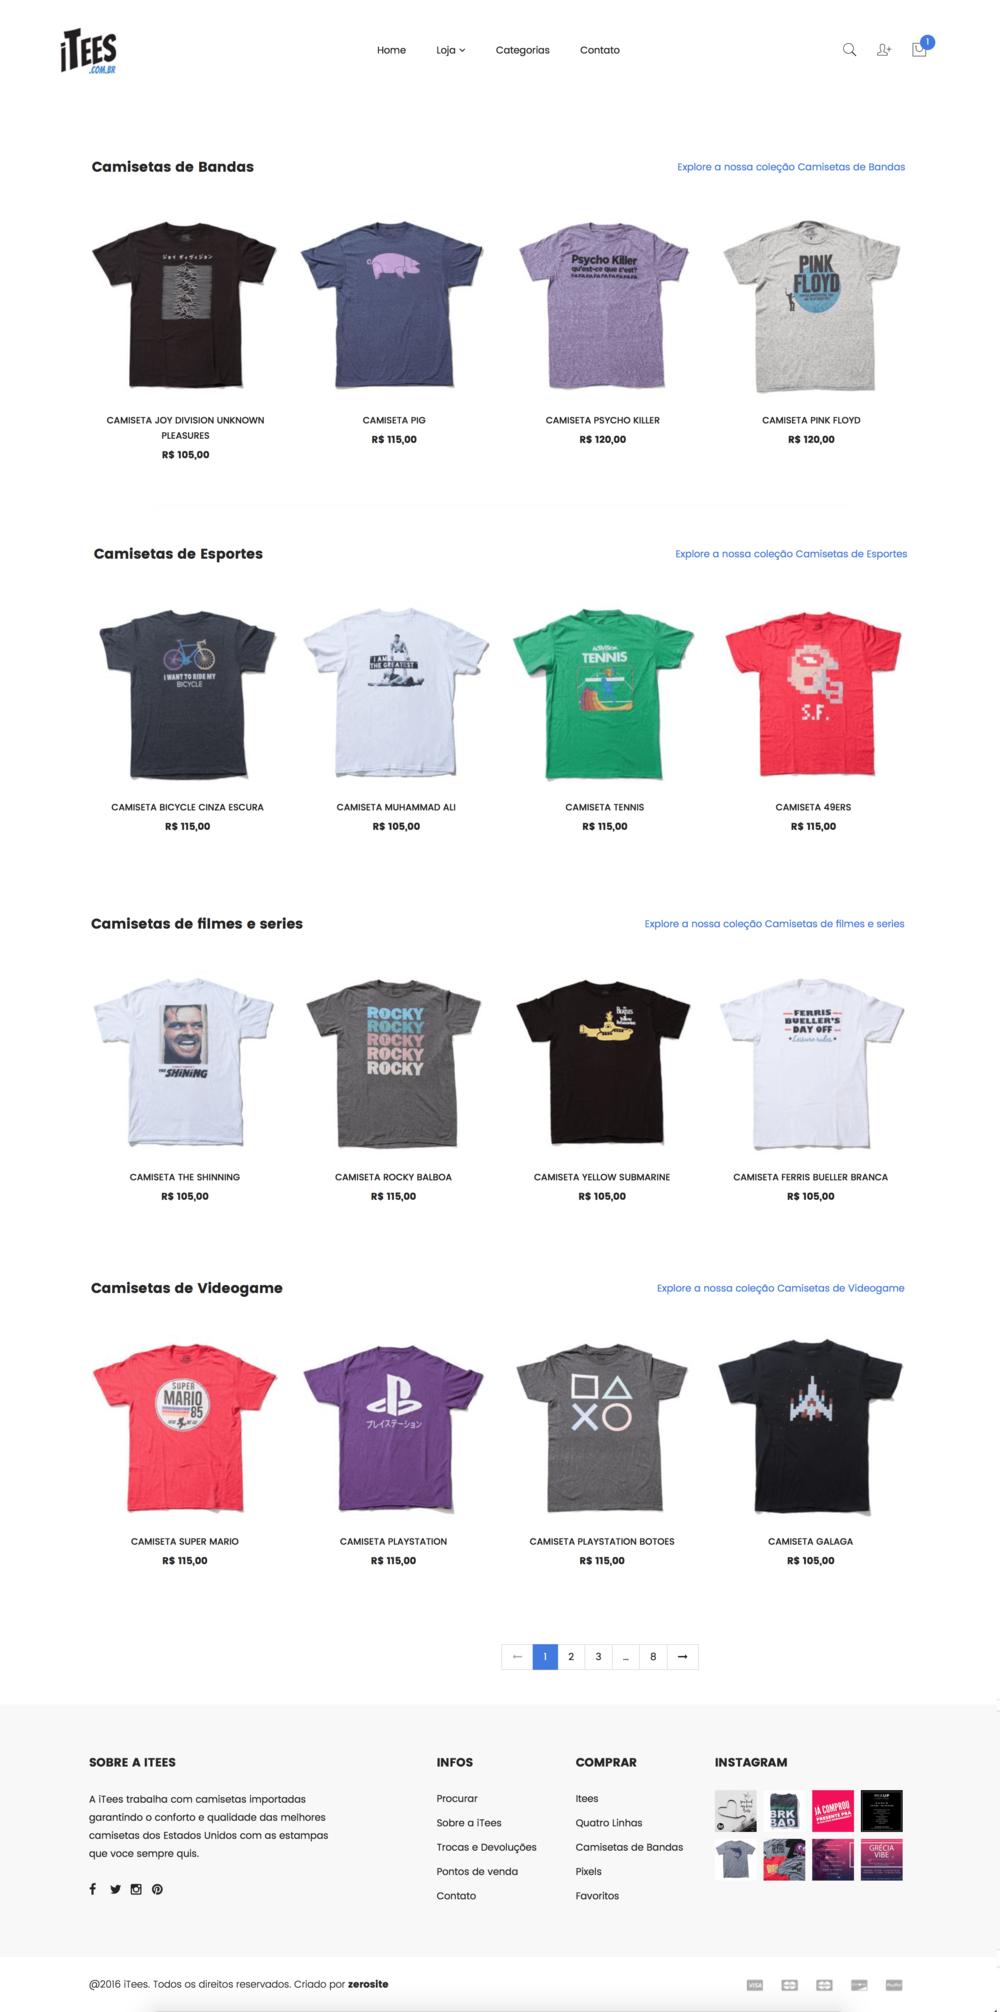 Camisetas de bandas, camisetas de videogame, e camisetas importadas femininas